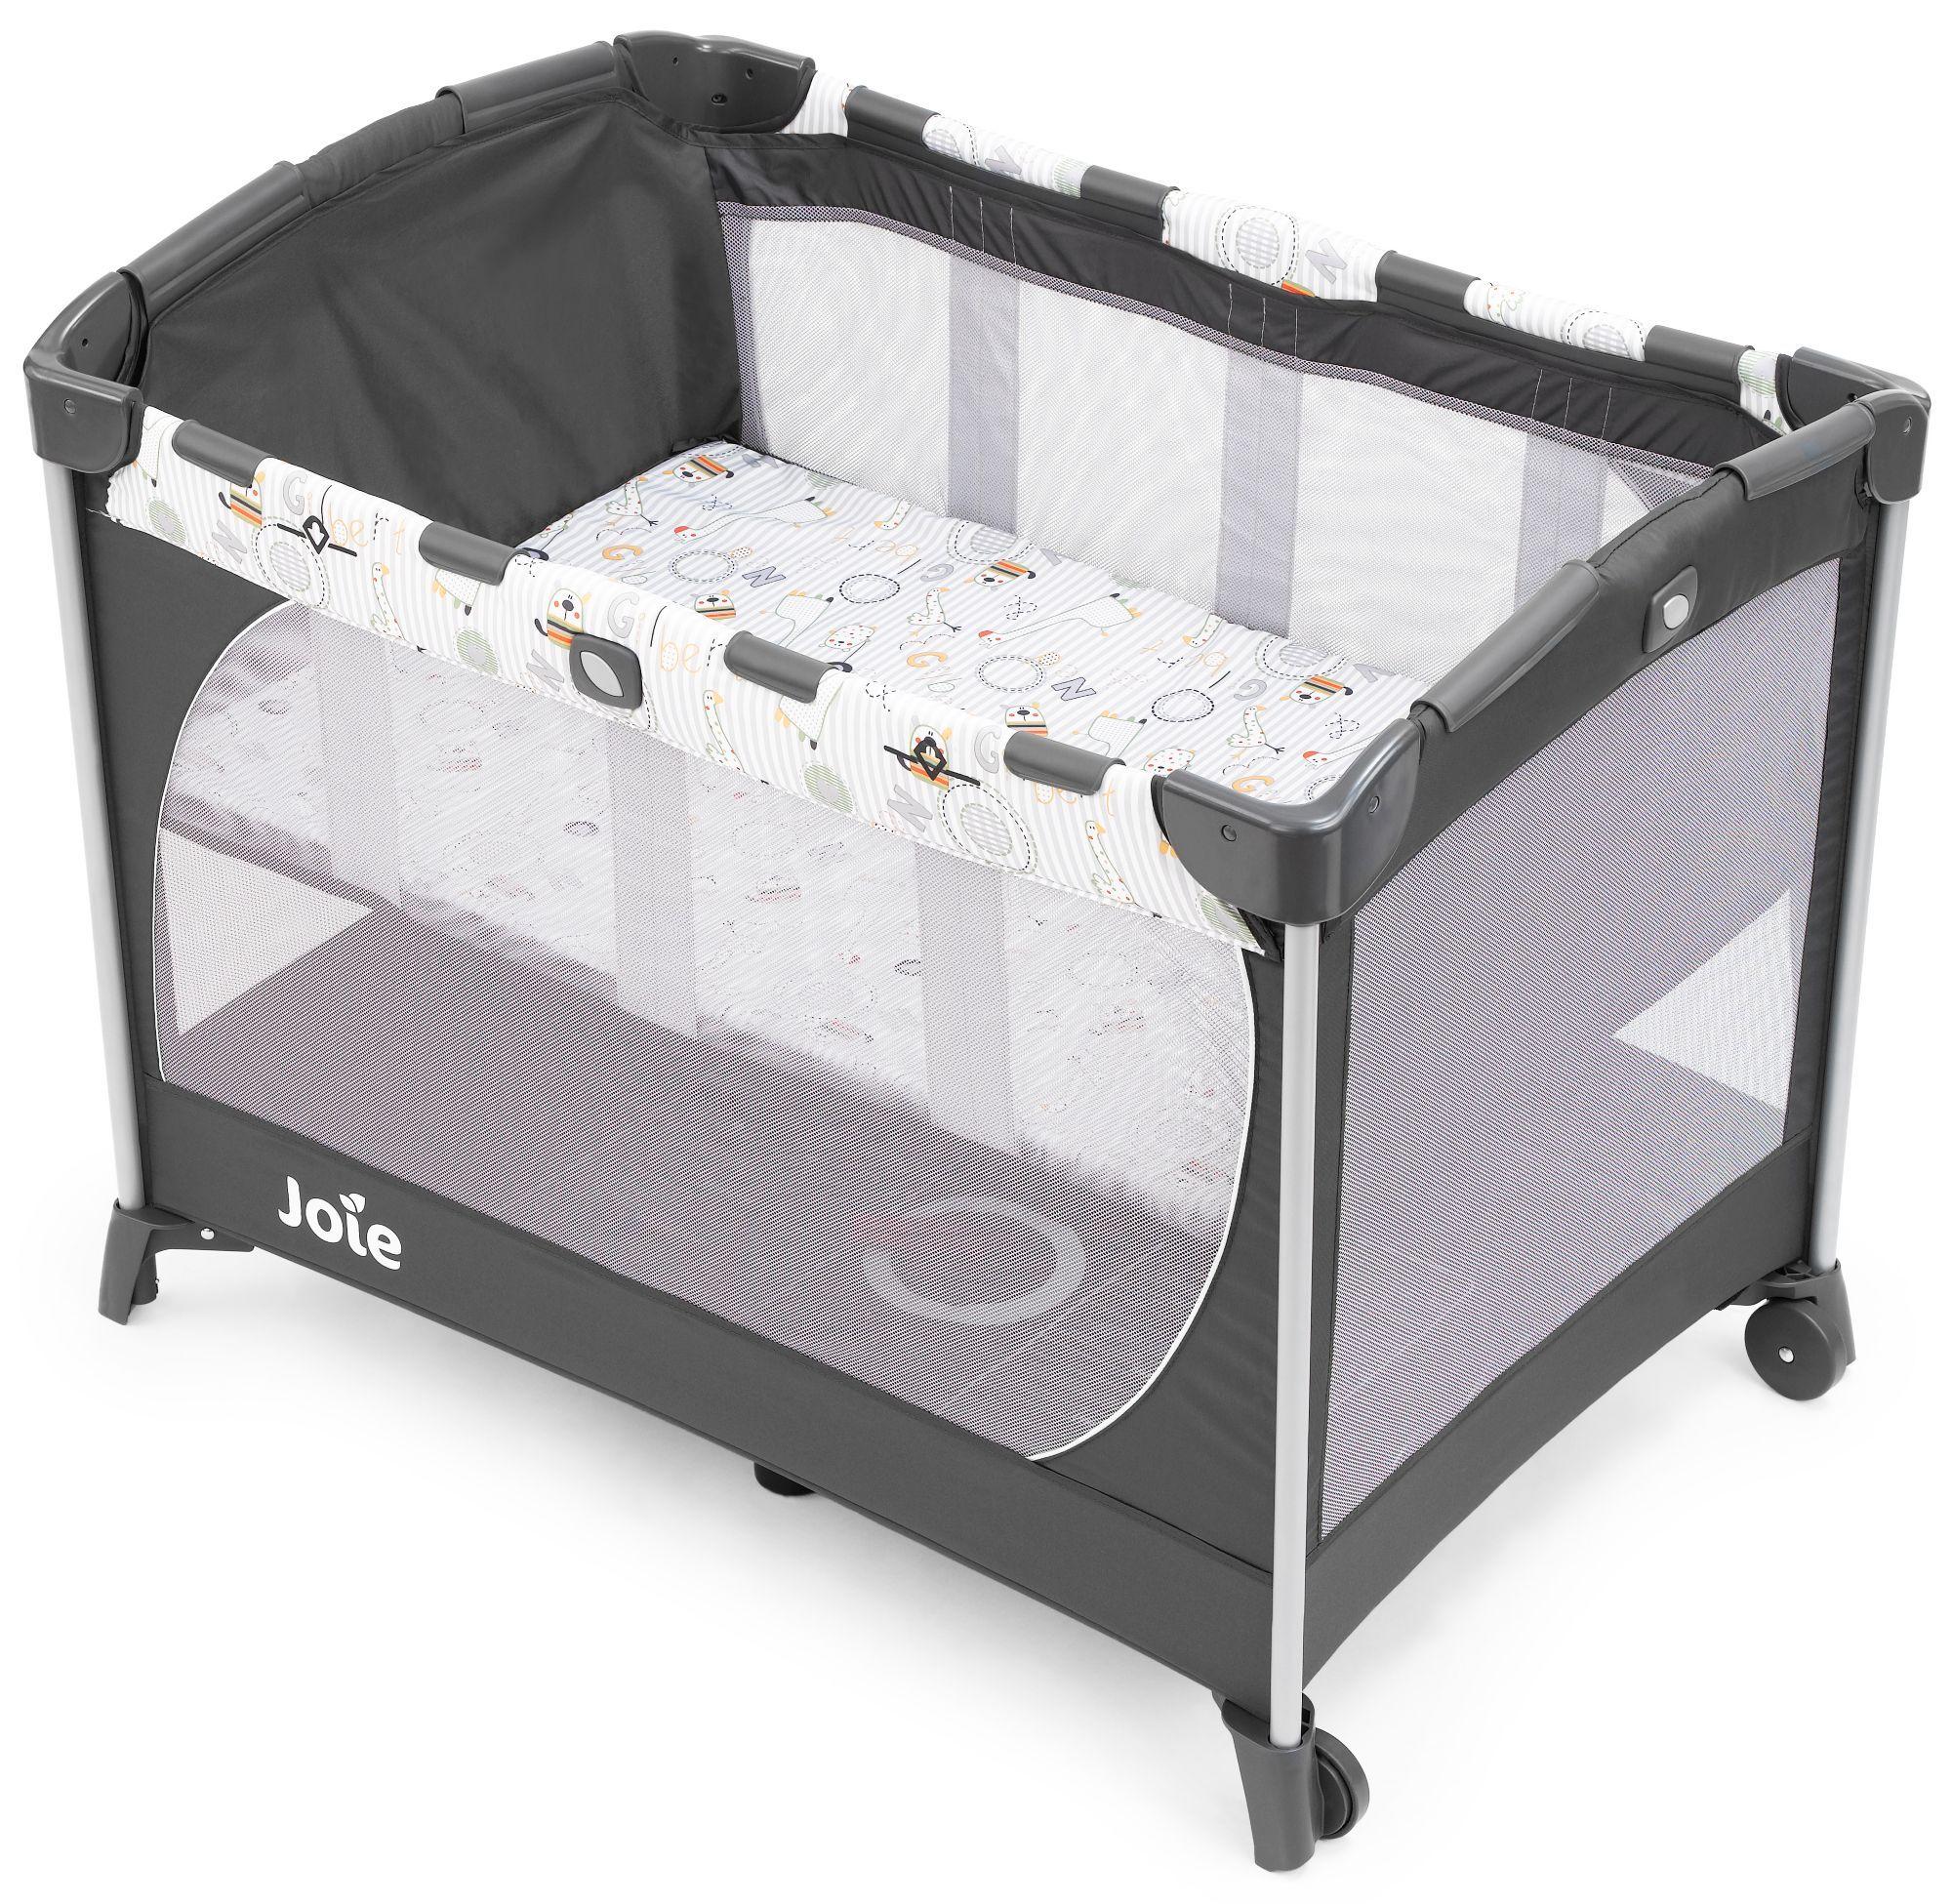 joie travel cot bassinet weight limit. Black Bedroom Furniture Sets. Home Design Ideas